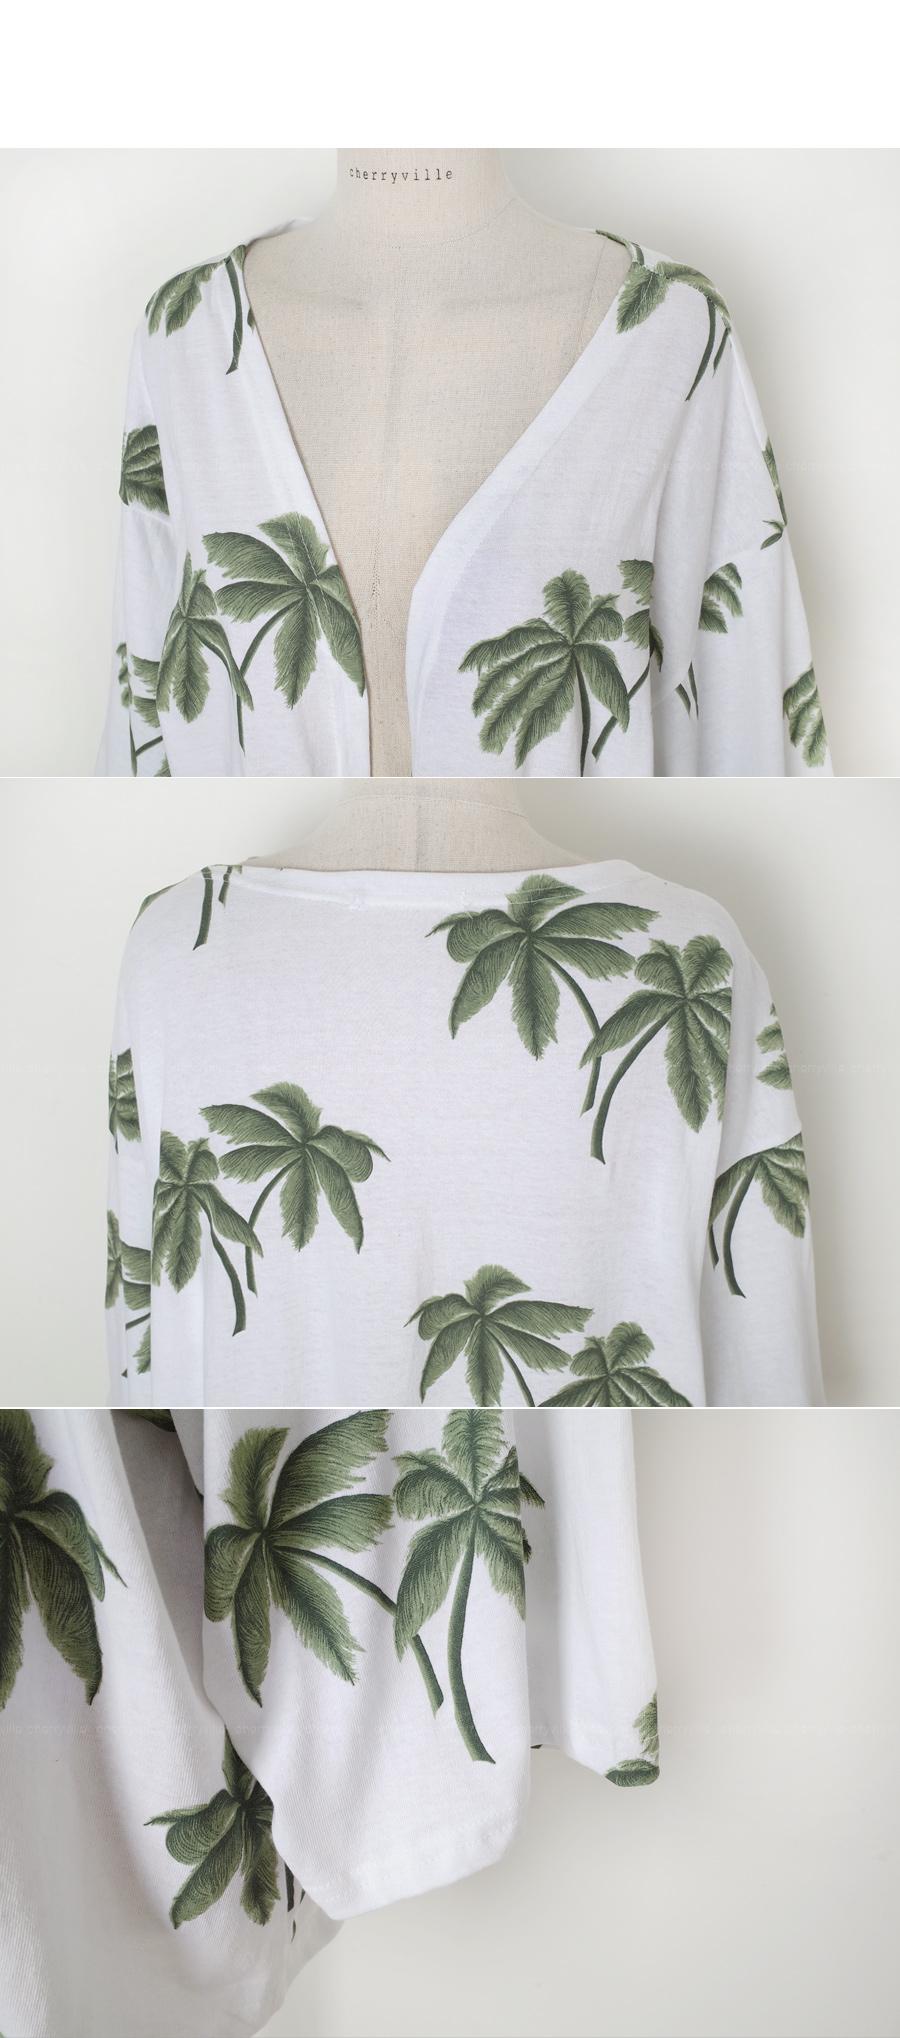 Sewing cardigan